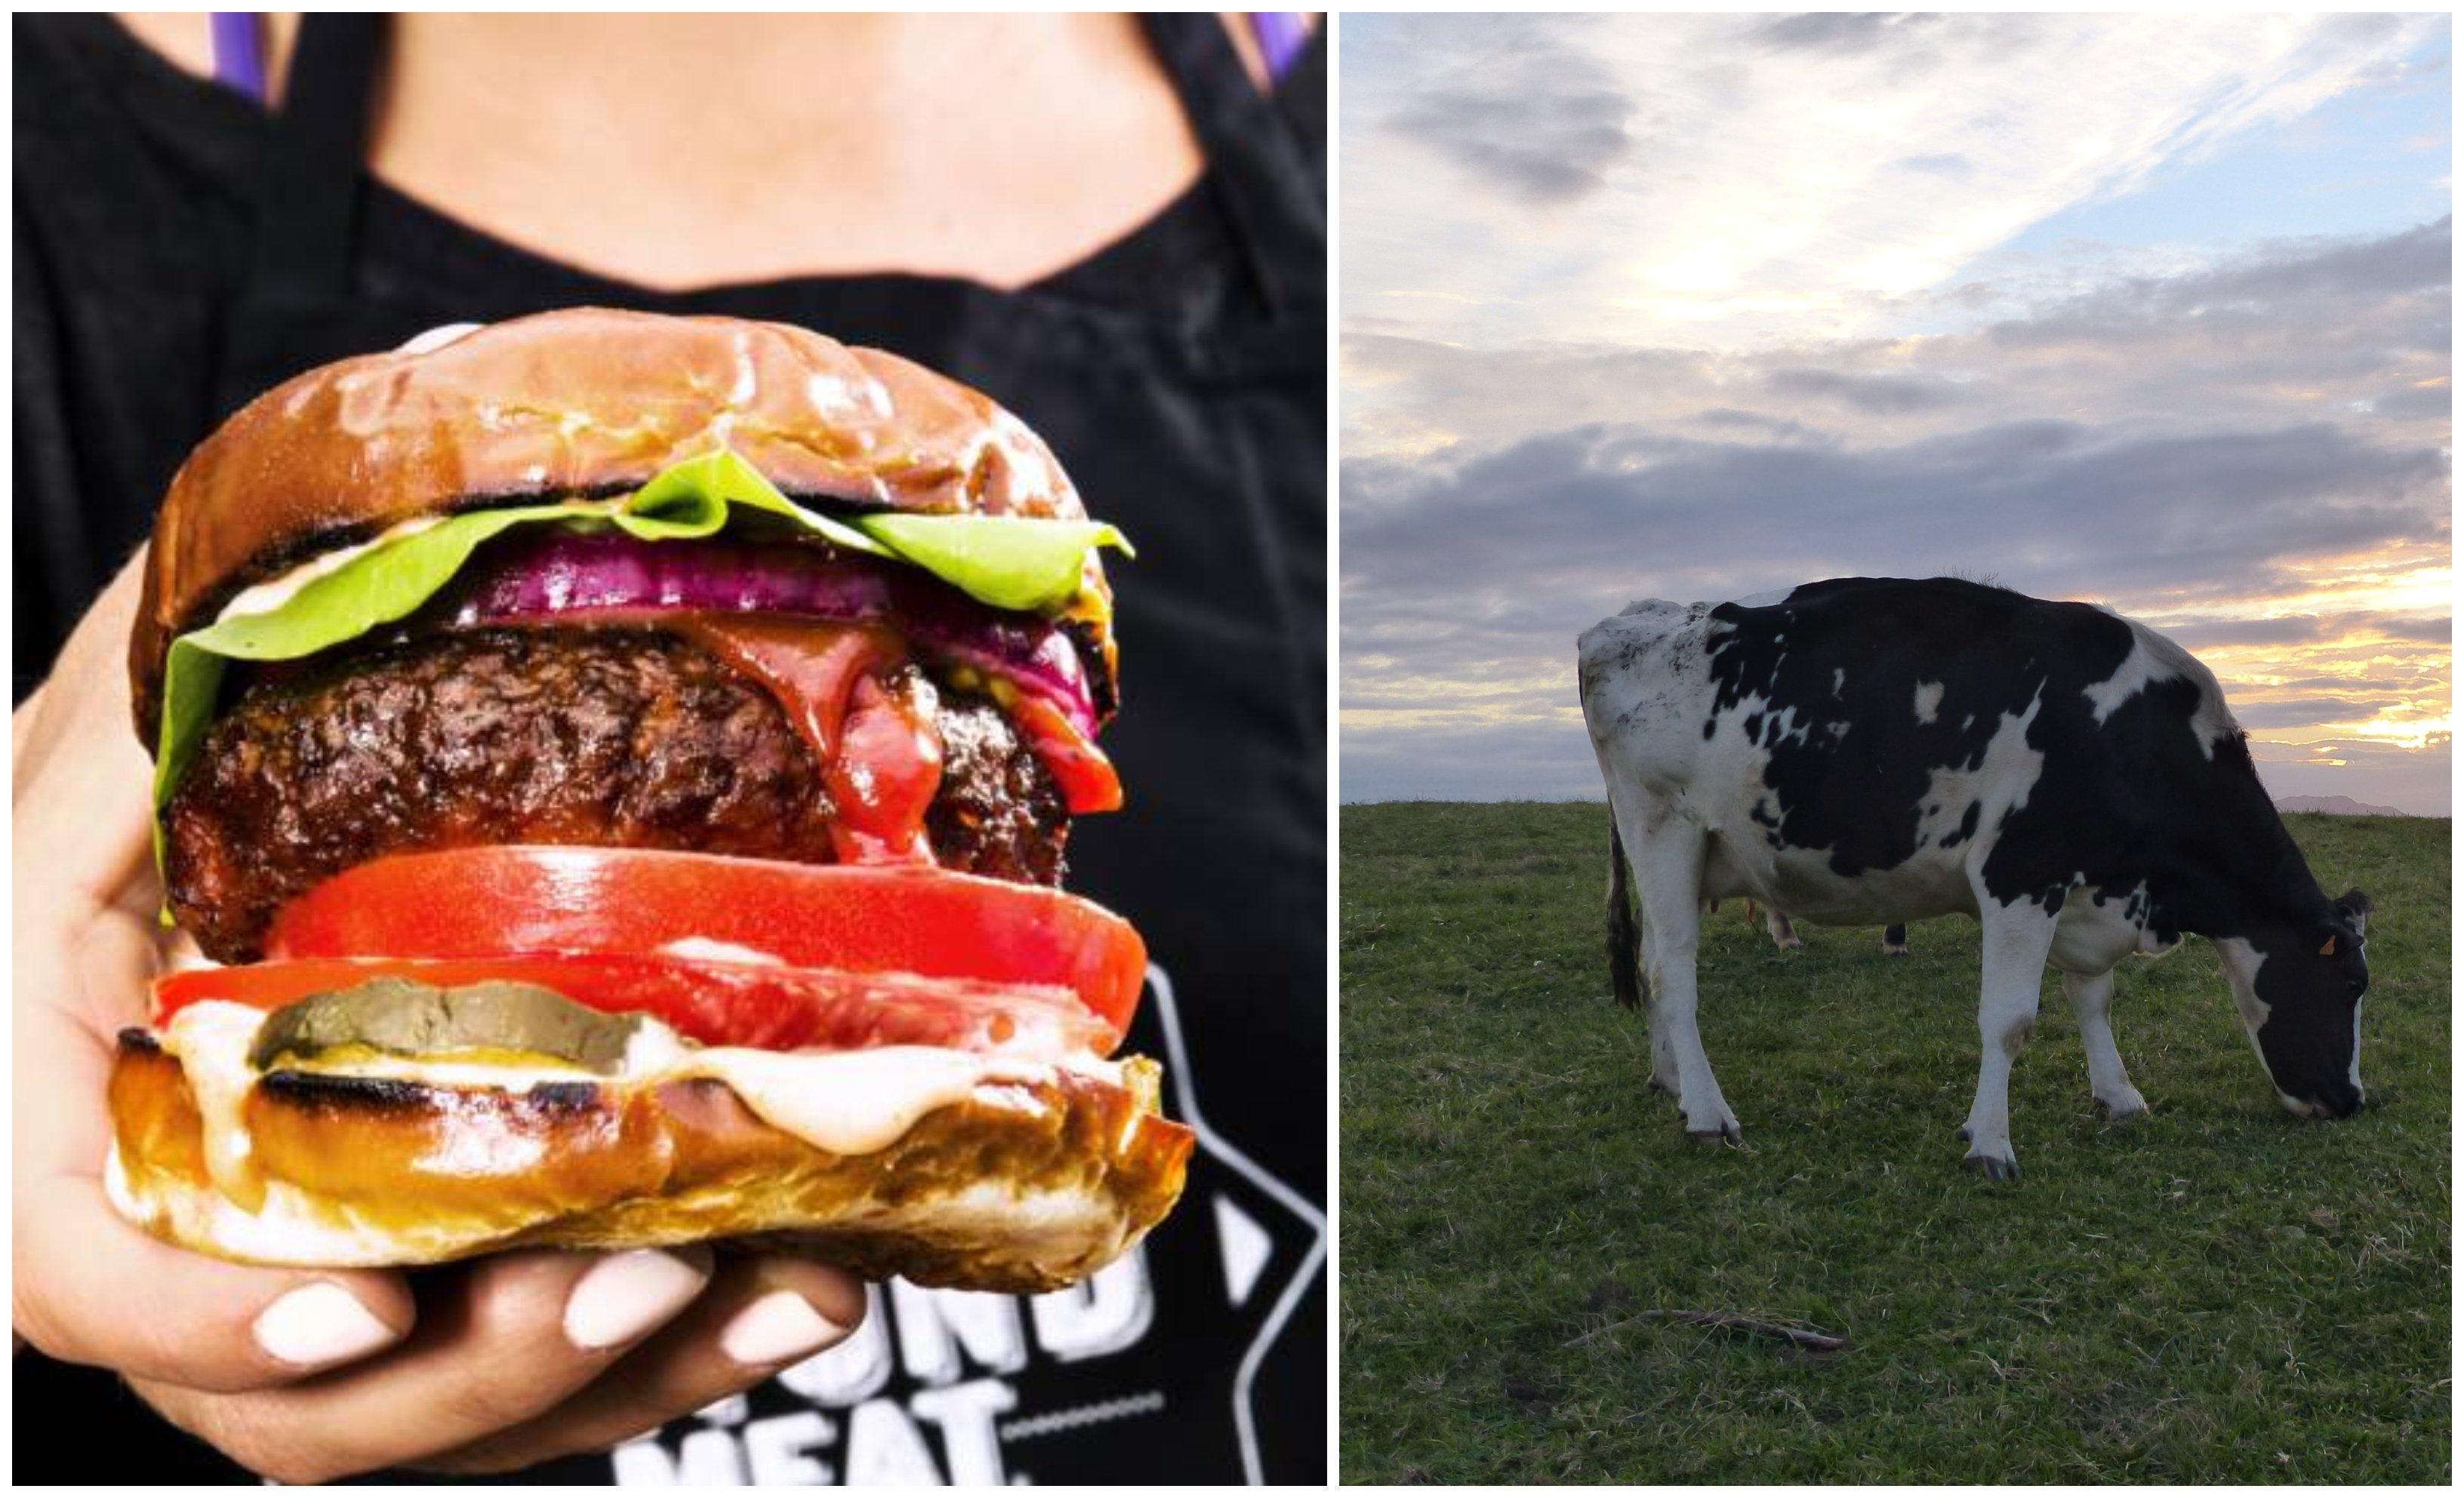 Hamburguesa vegetariana frente a carne de toda la vida